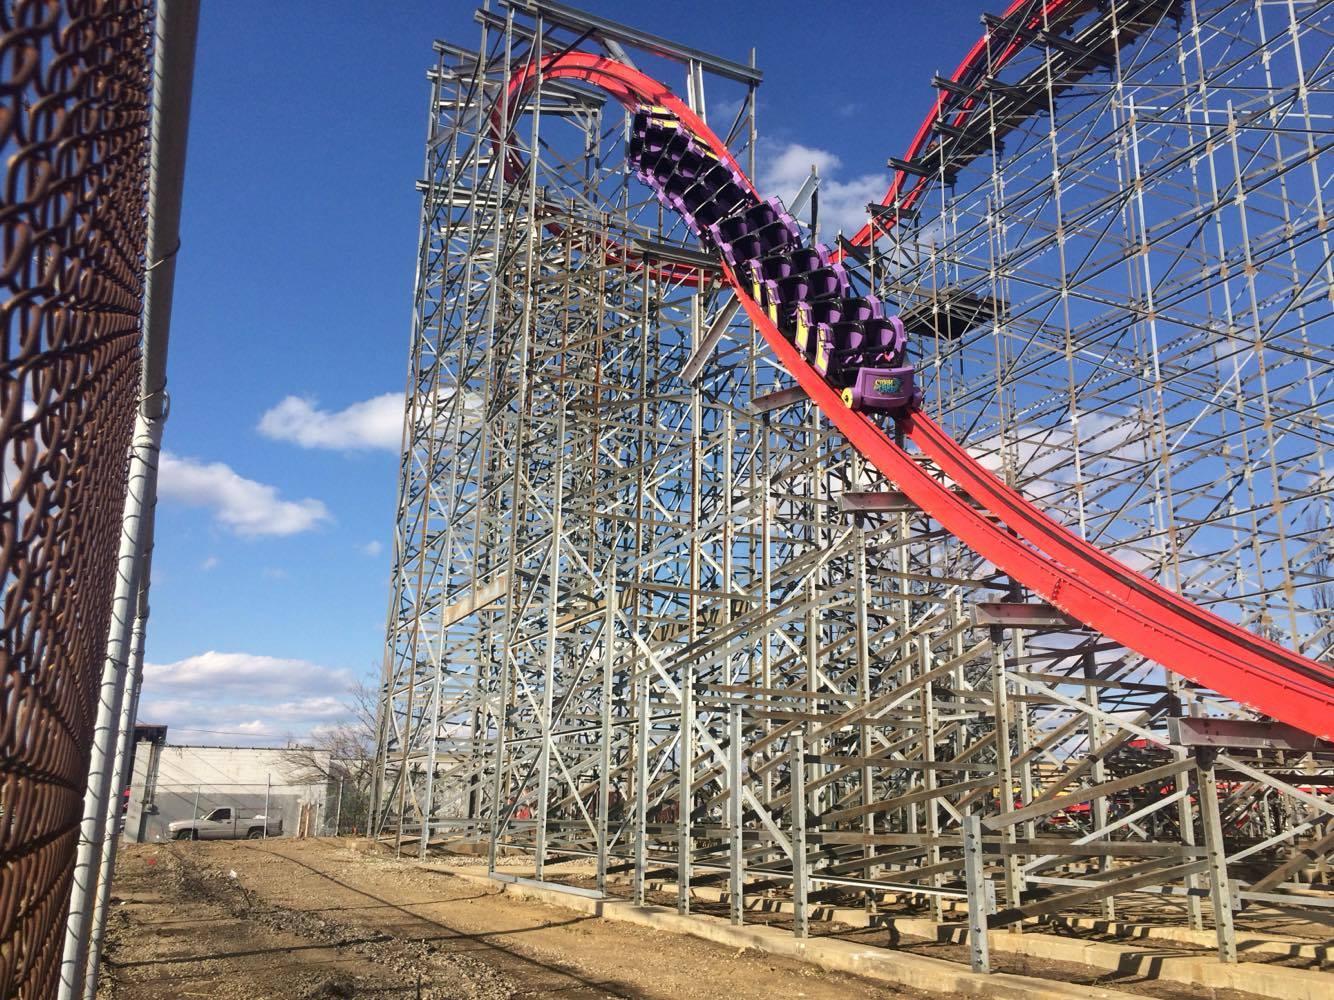 storm chaser testing at kentucky kingdom coaster101